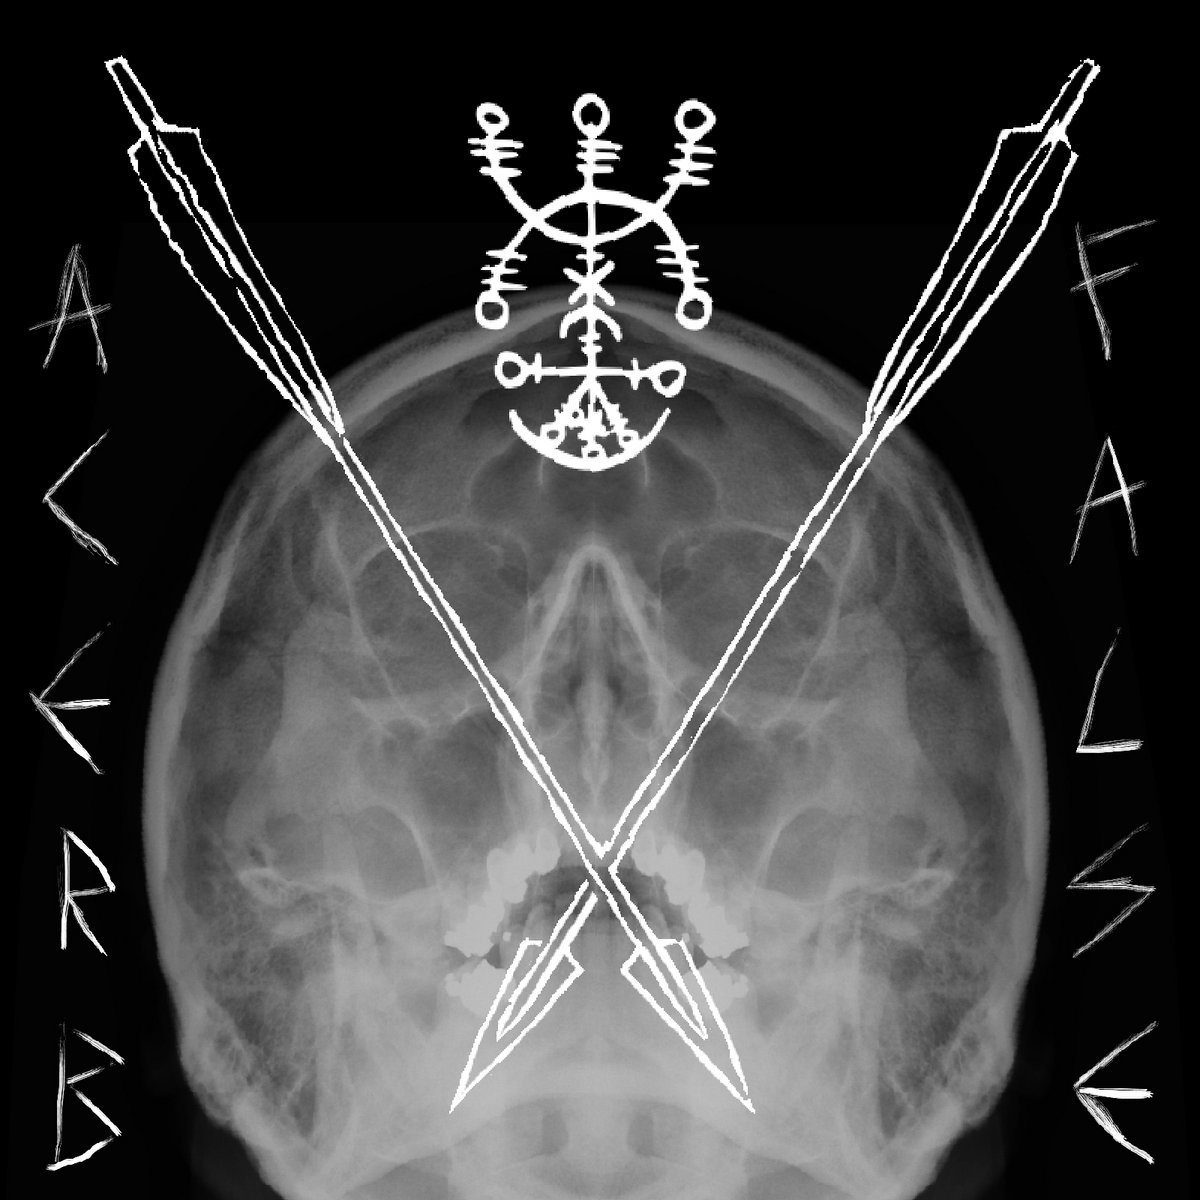 Spiral Fracture Paragraphs